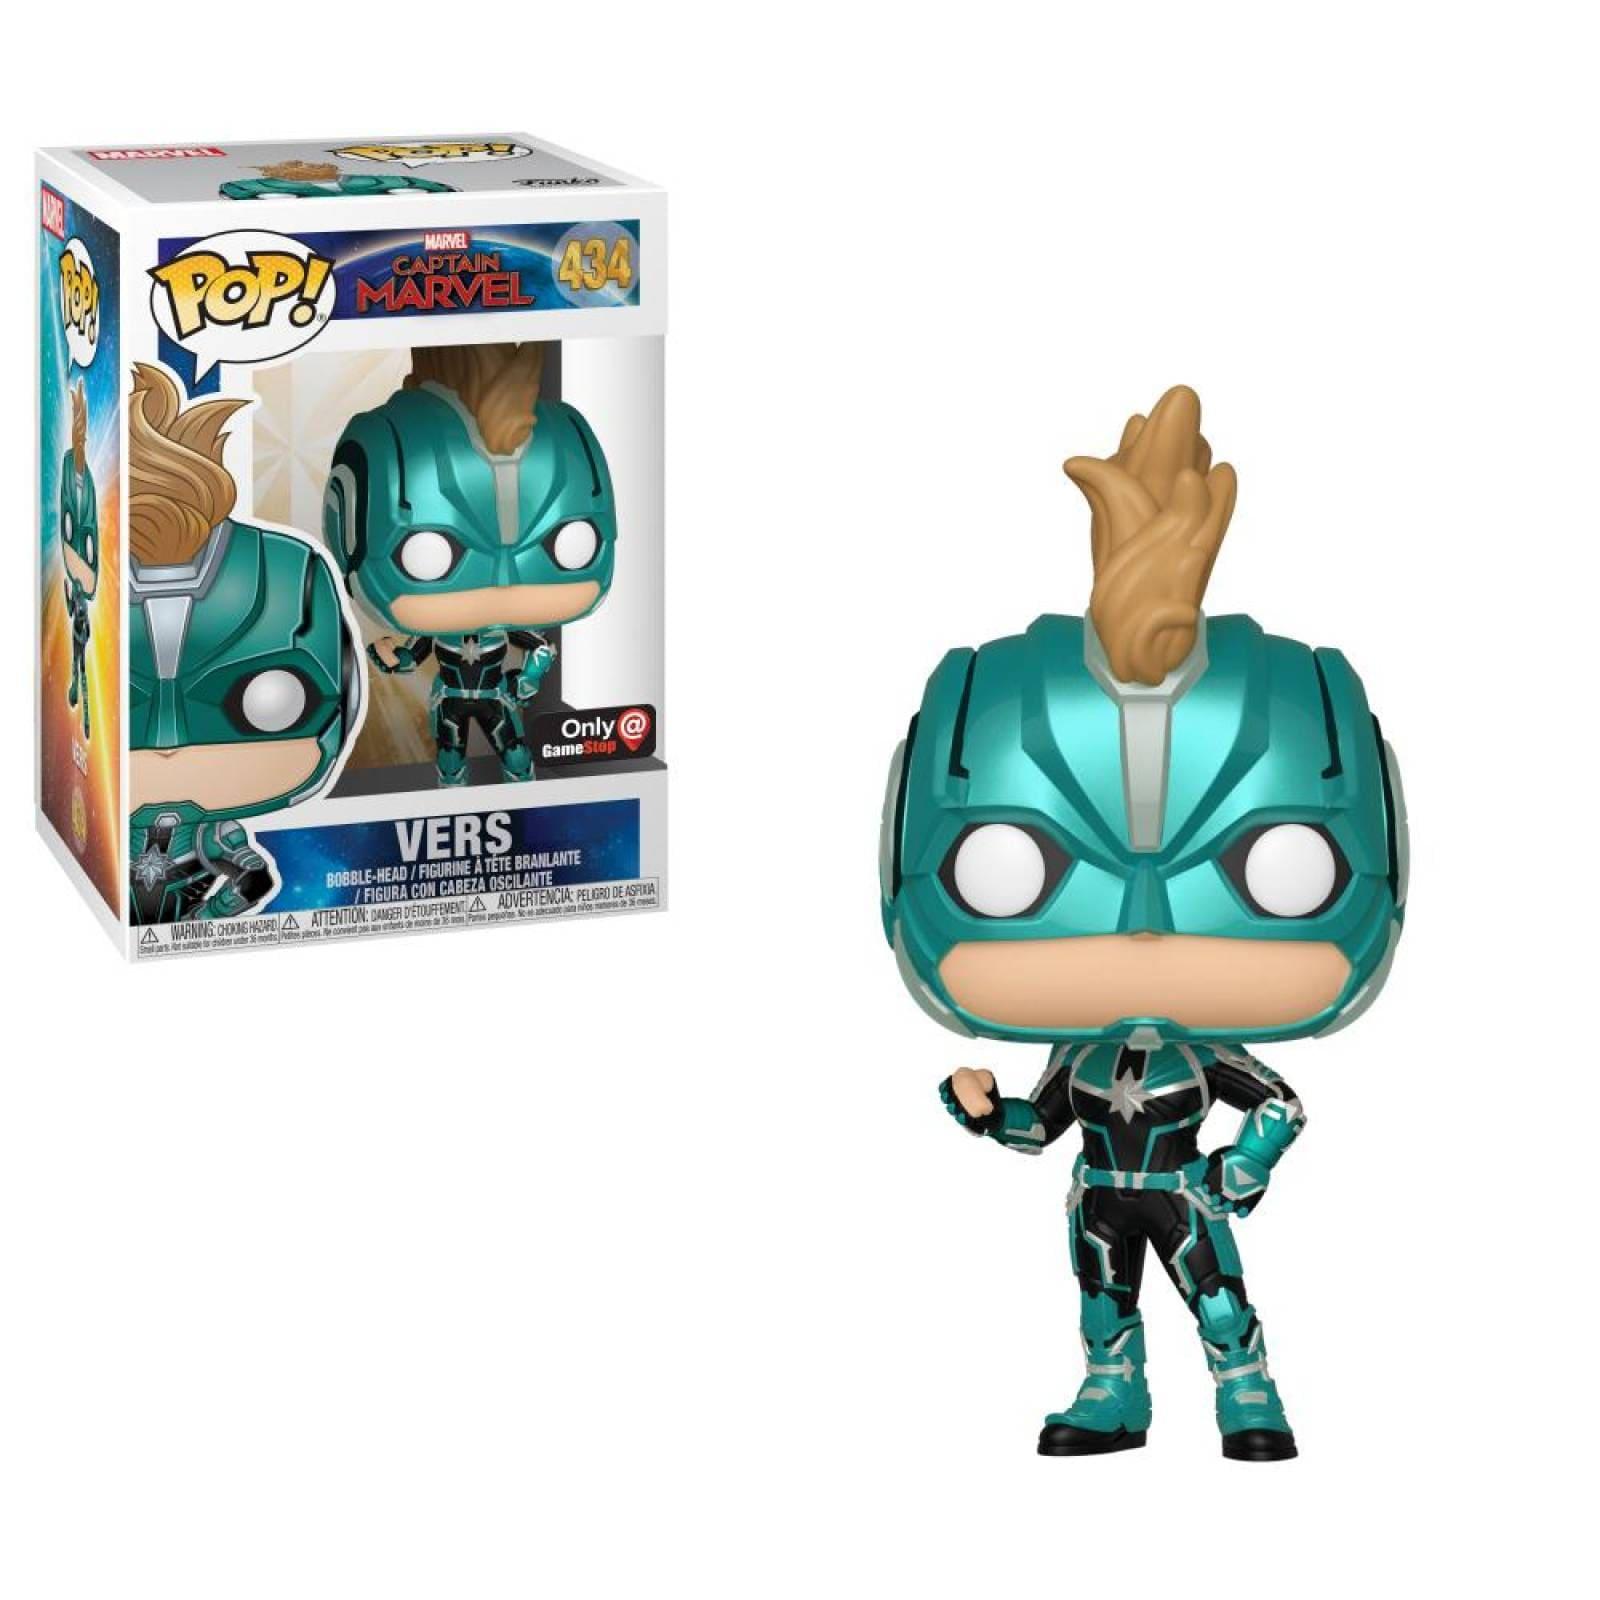 Vers Funko Pop Capitana Marvel Exclusivo con Protector